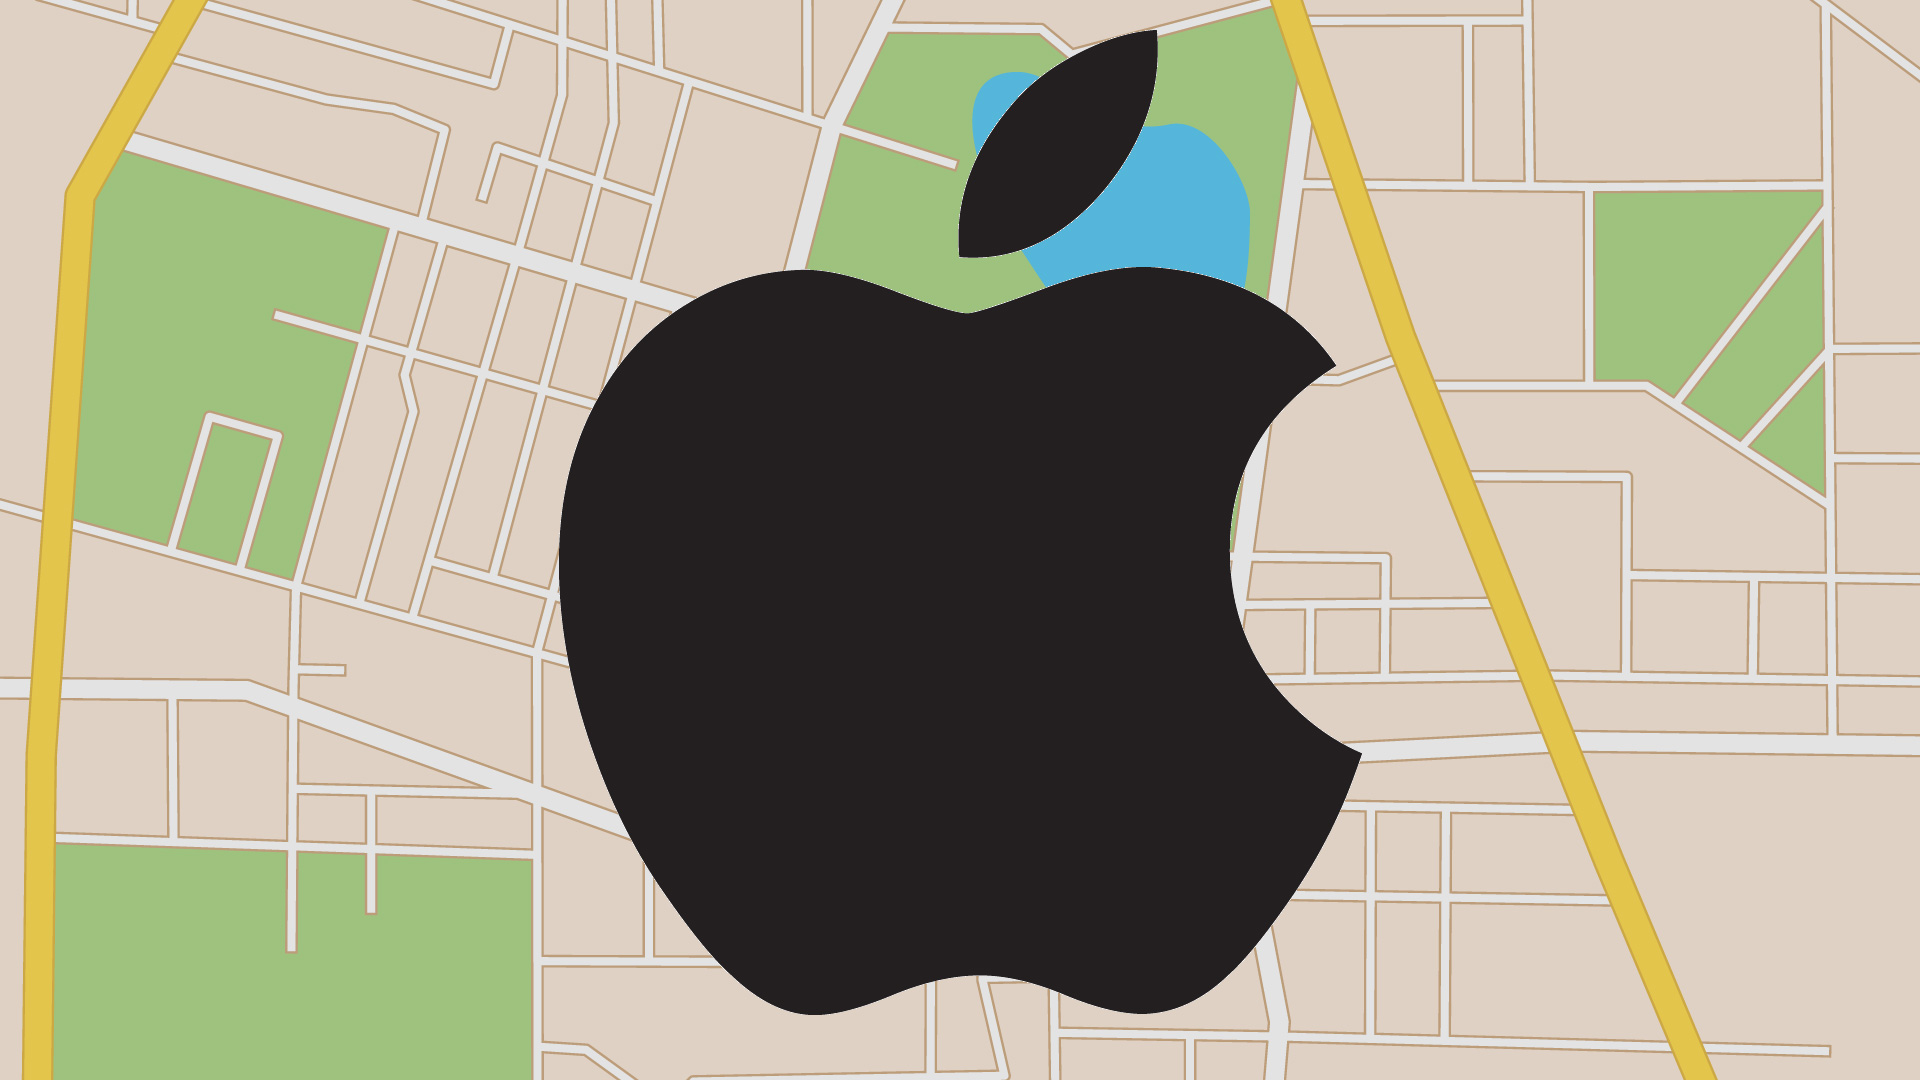 apple-maps3-ss-1920